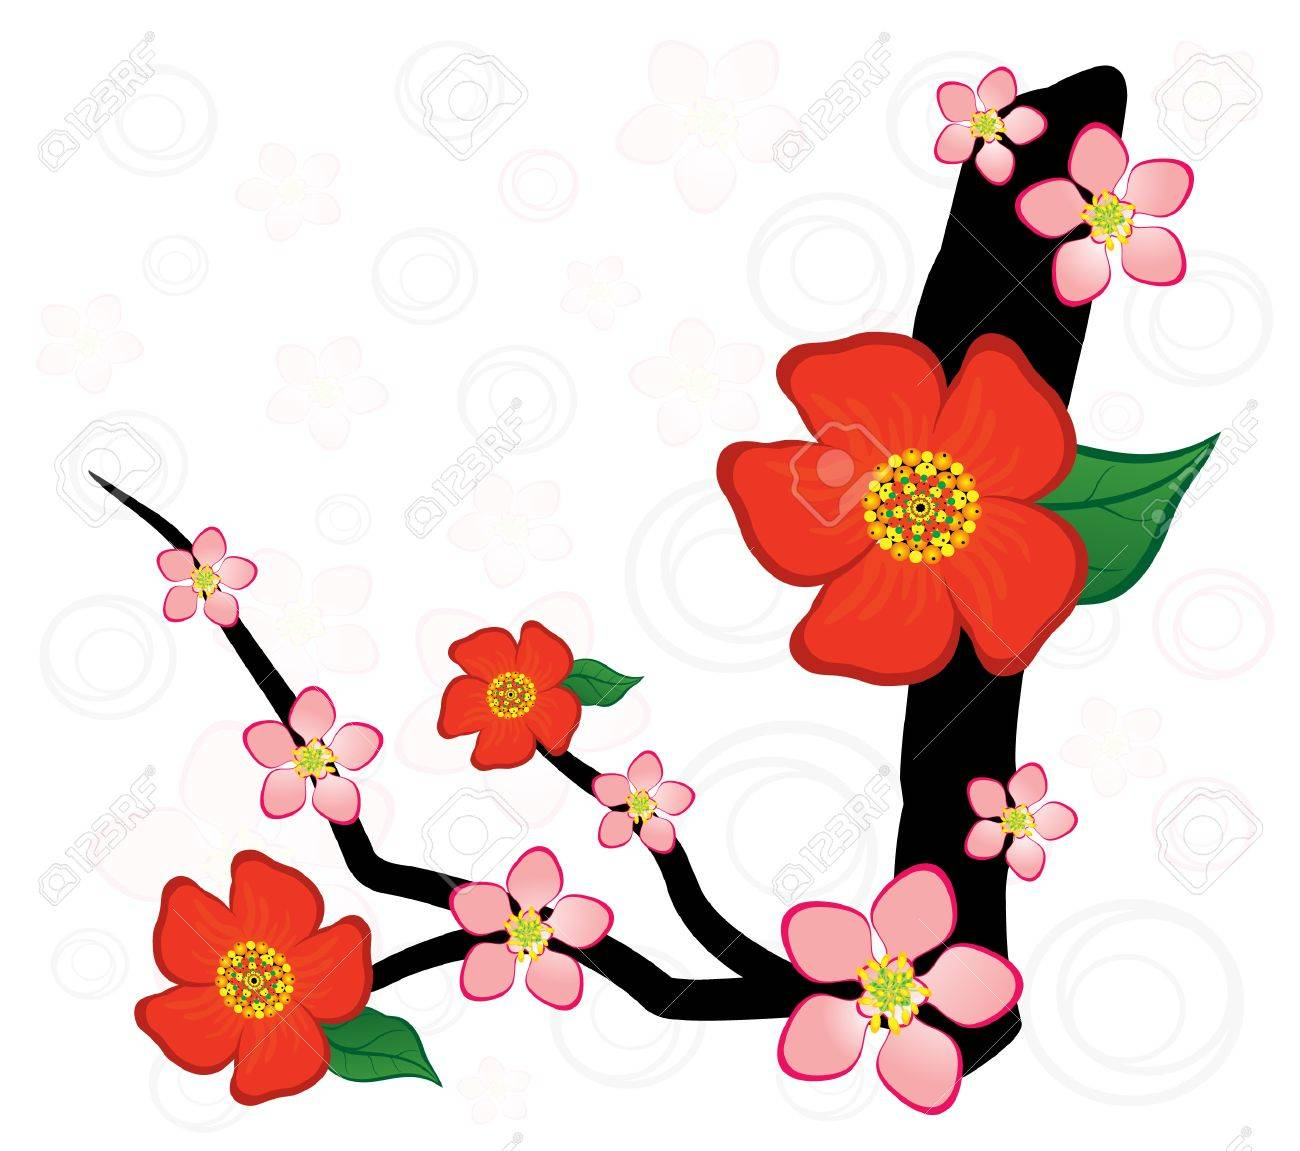 1300x1151 Alphabet With Gentle Sakura Flowers. Letter I Royalty Free